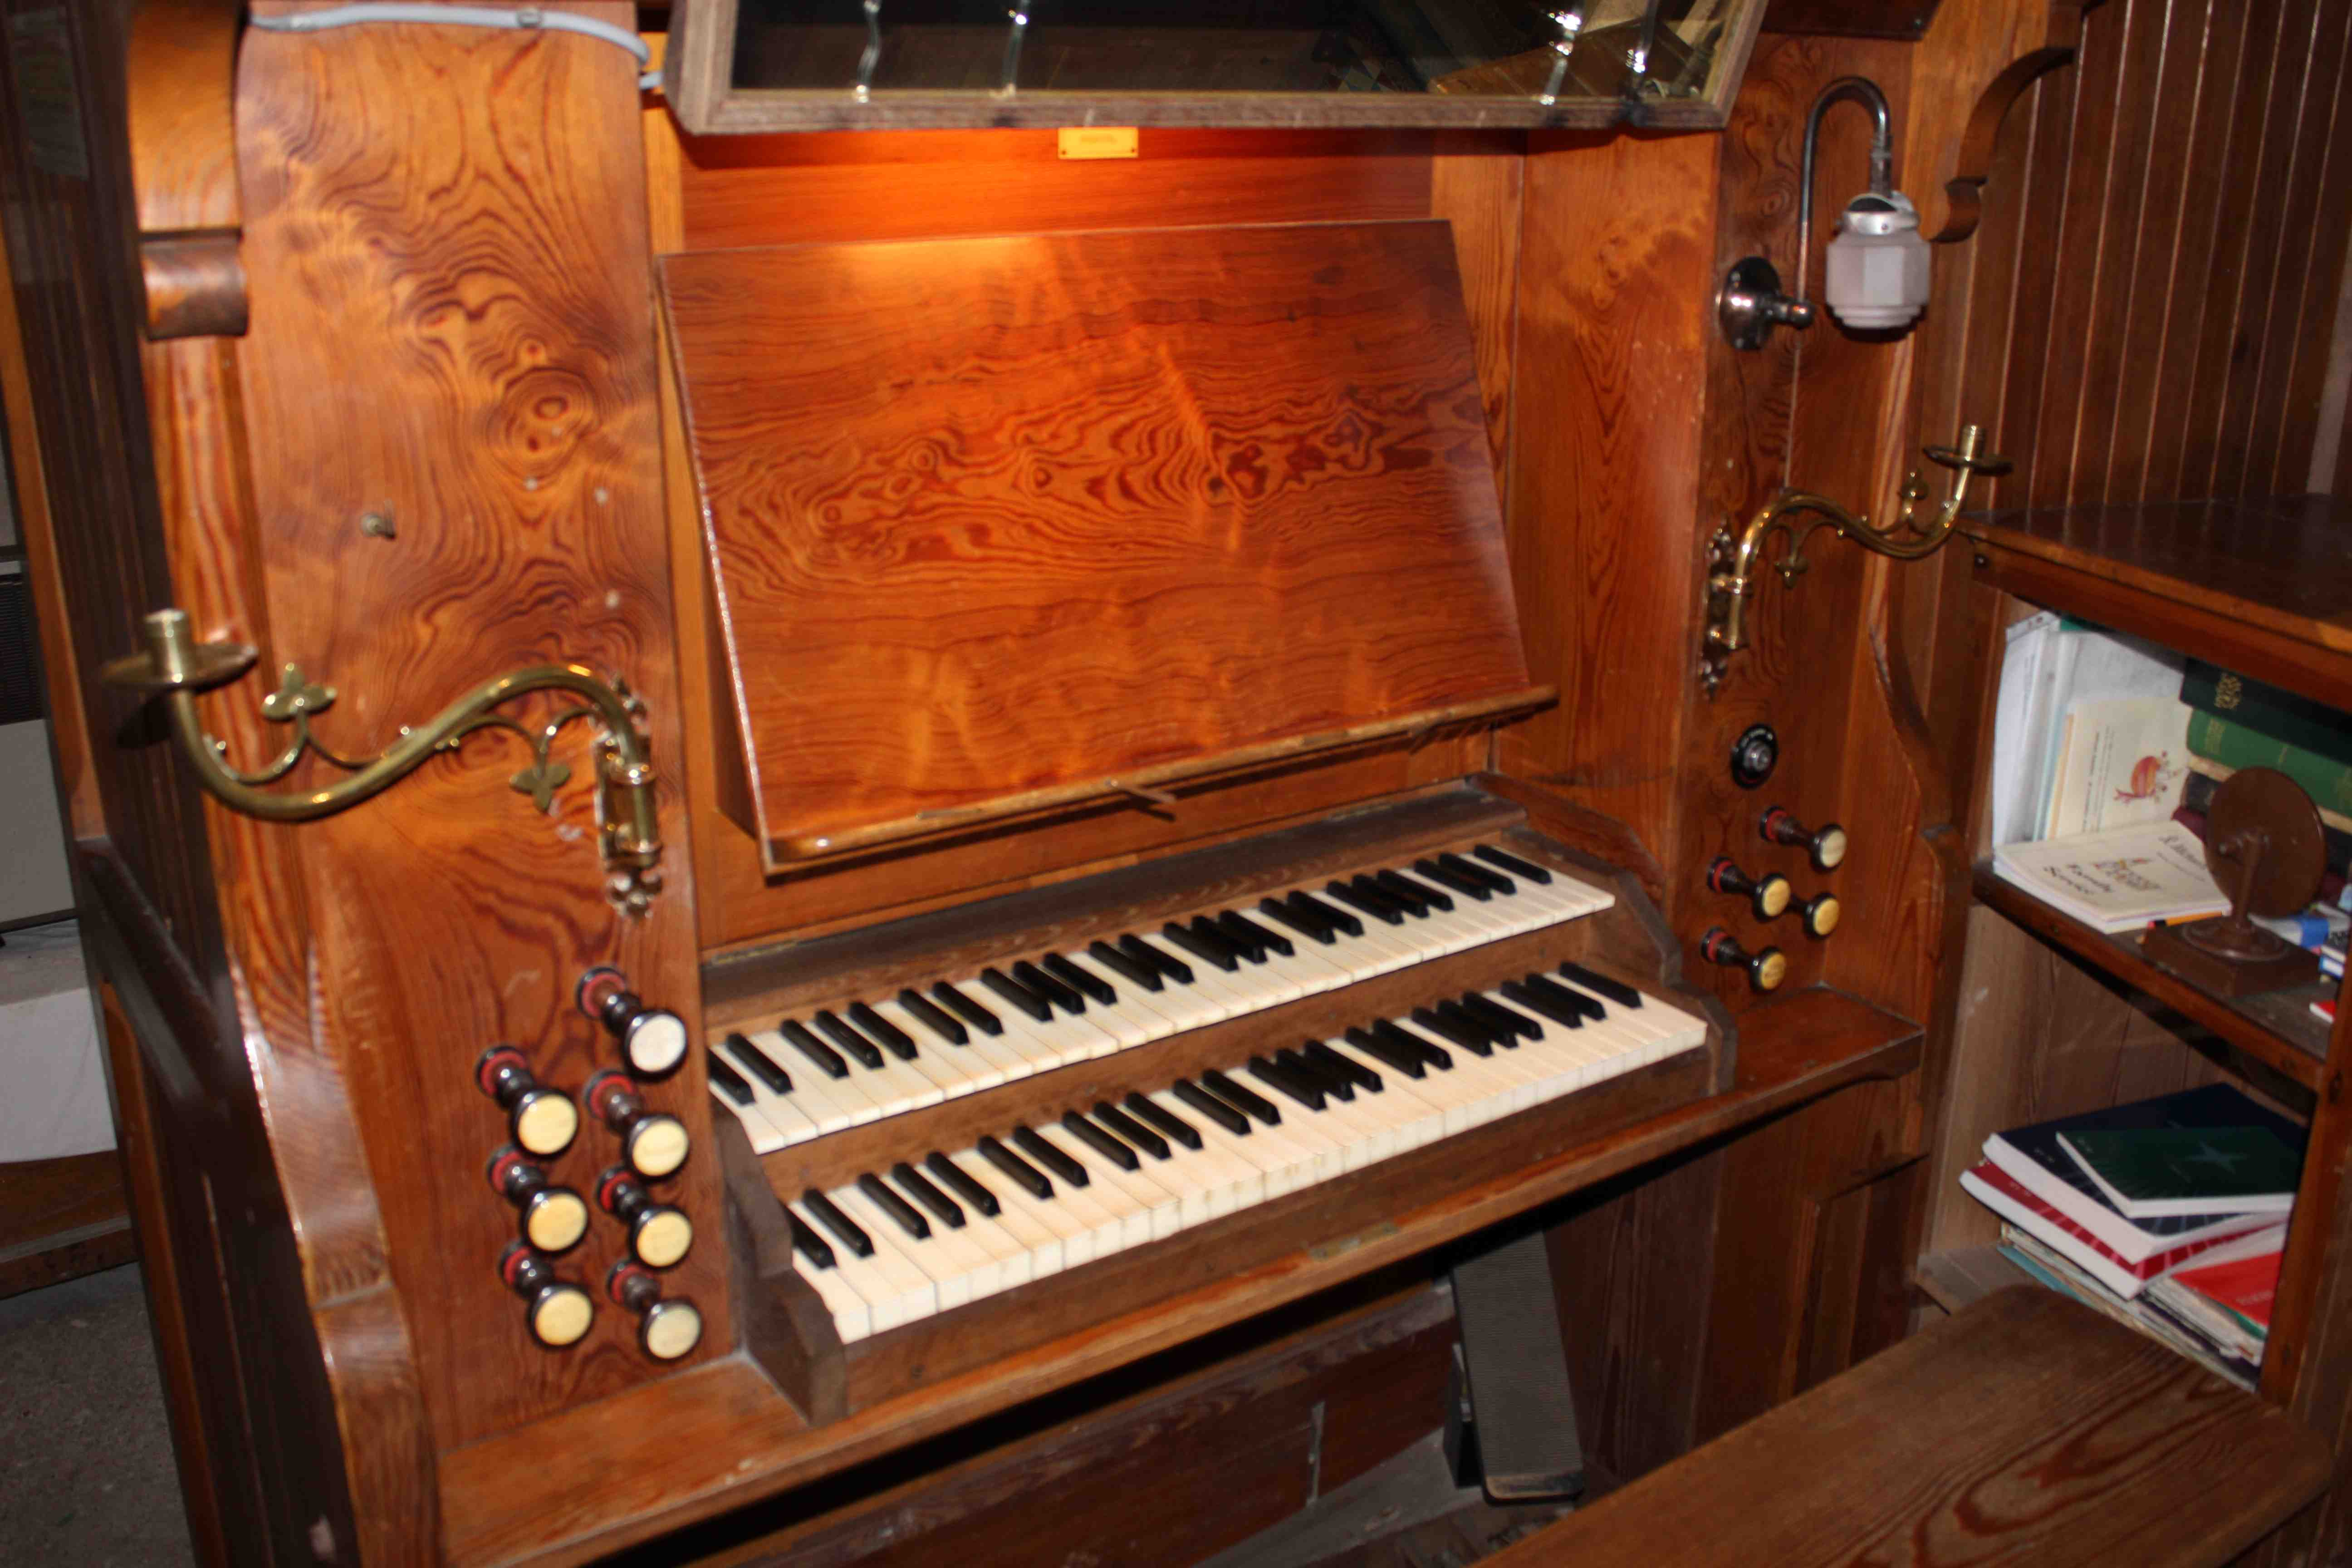 Butcombe Parish Church organ, which Milford played